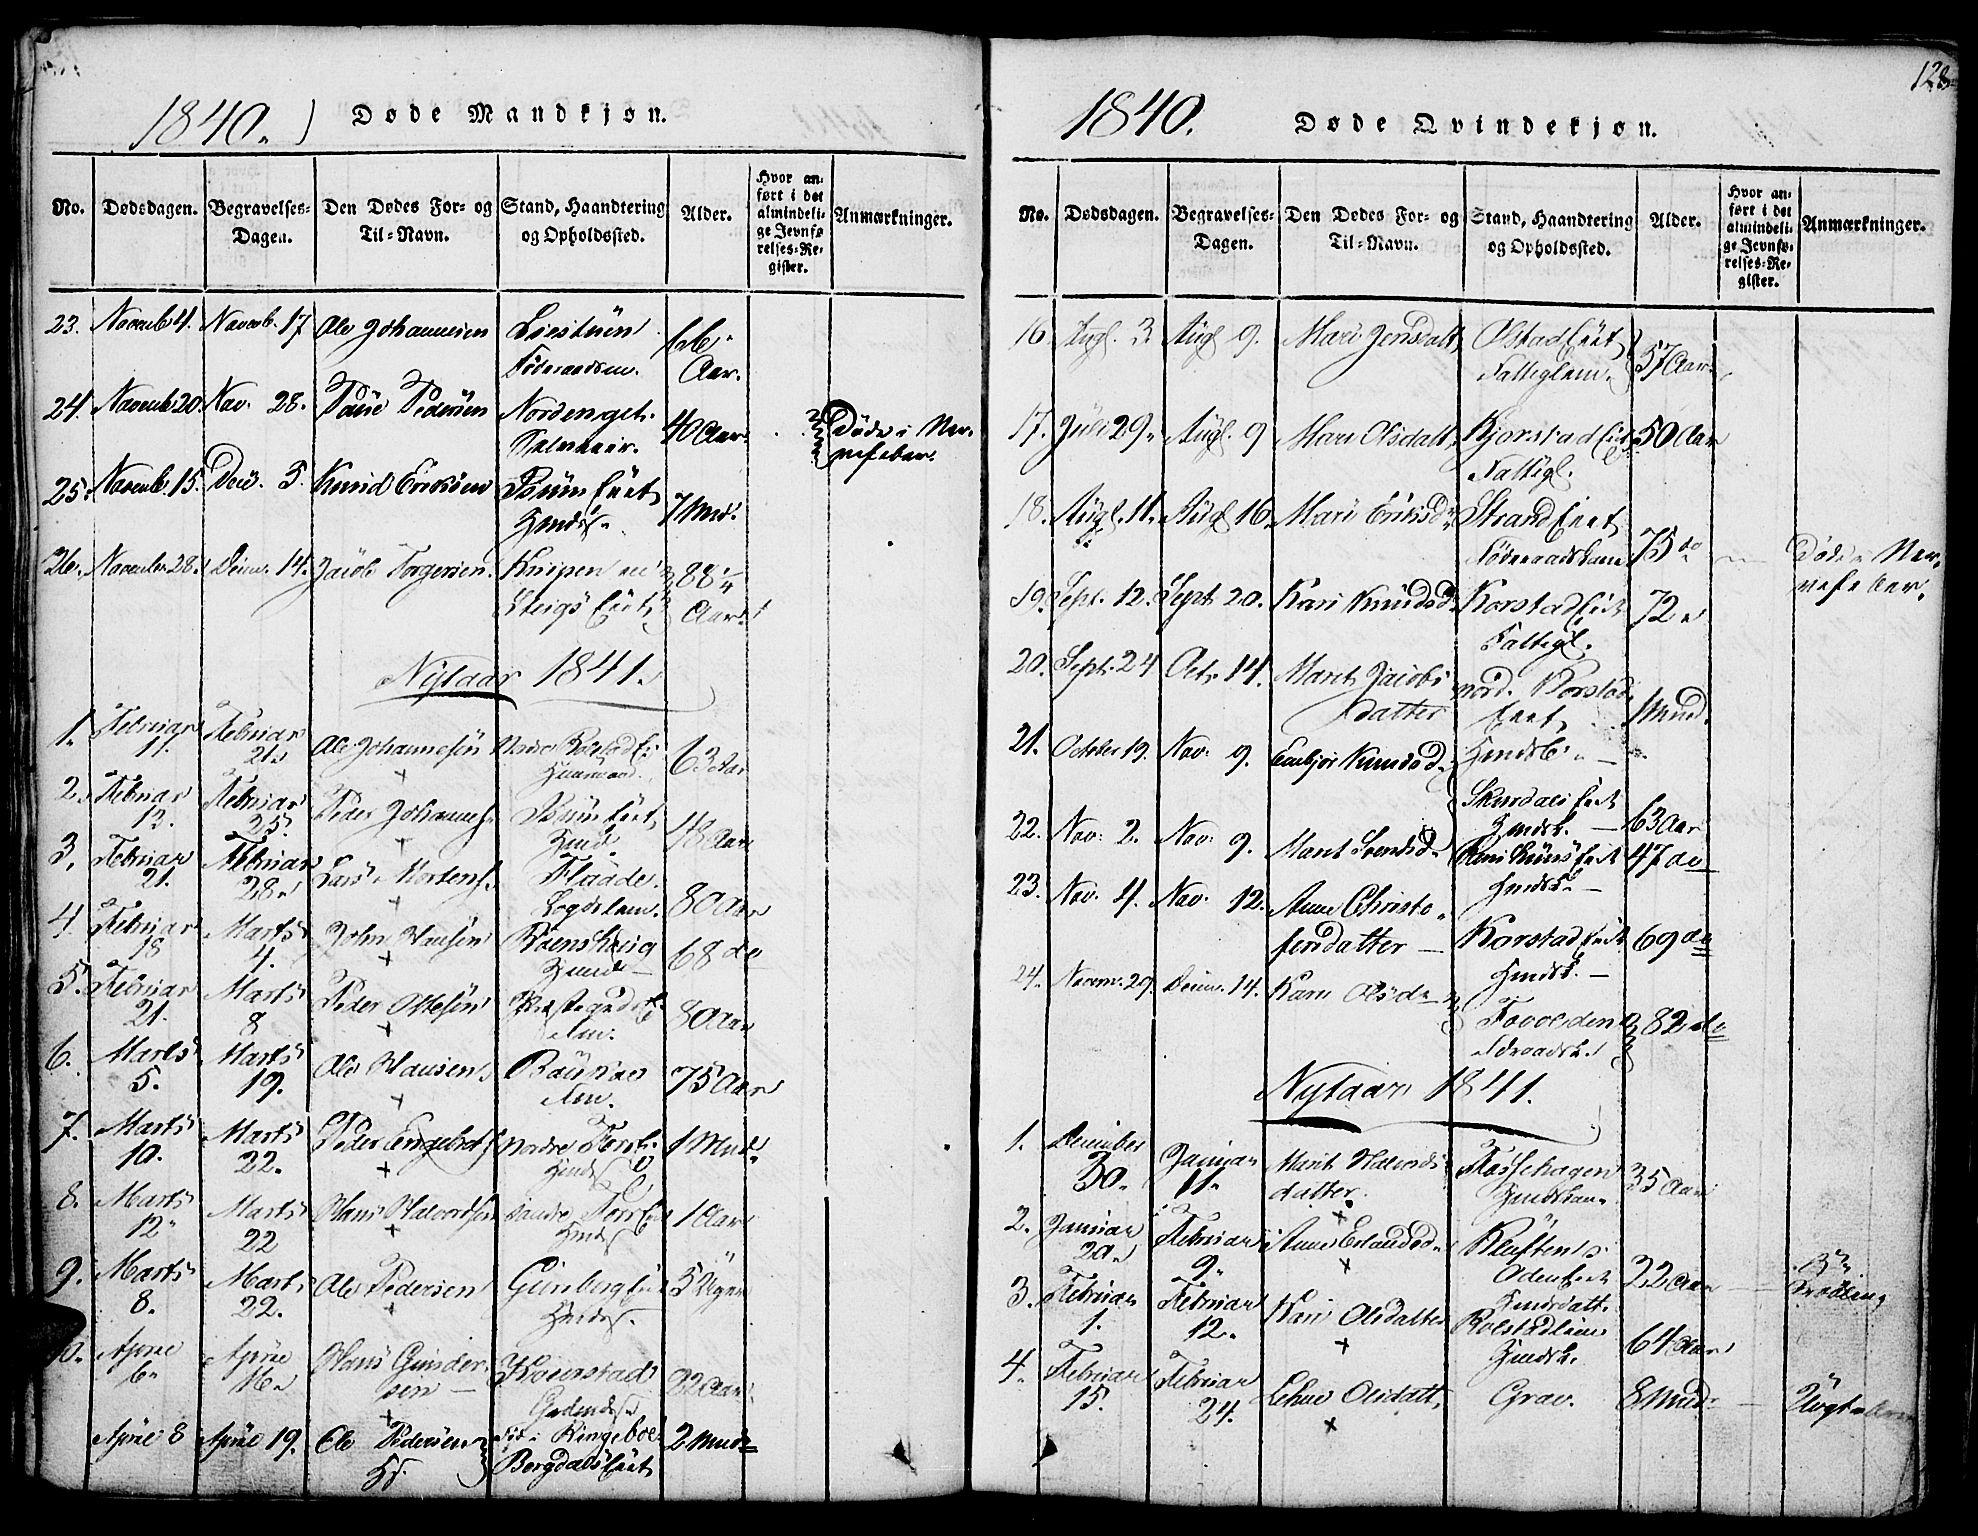 SAH, Fron prestekontor, H/Ha/Hab/L0001: Klokkerbok nr. 1, 1816-1843, s. 128